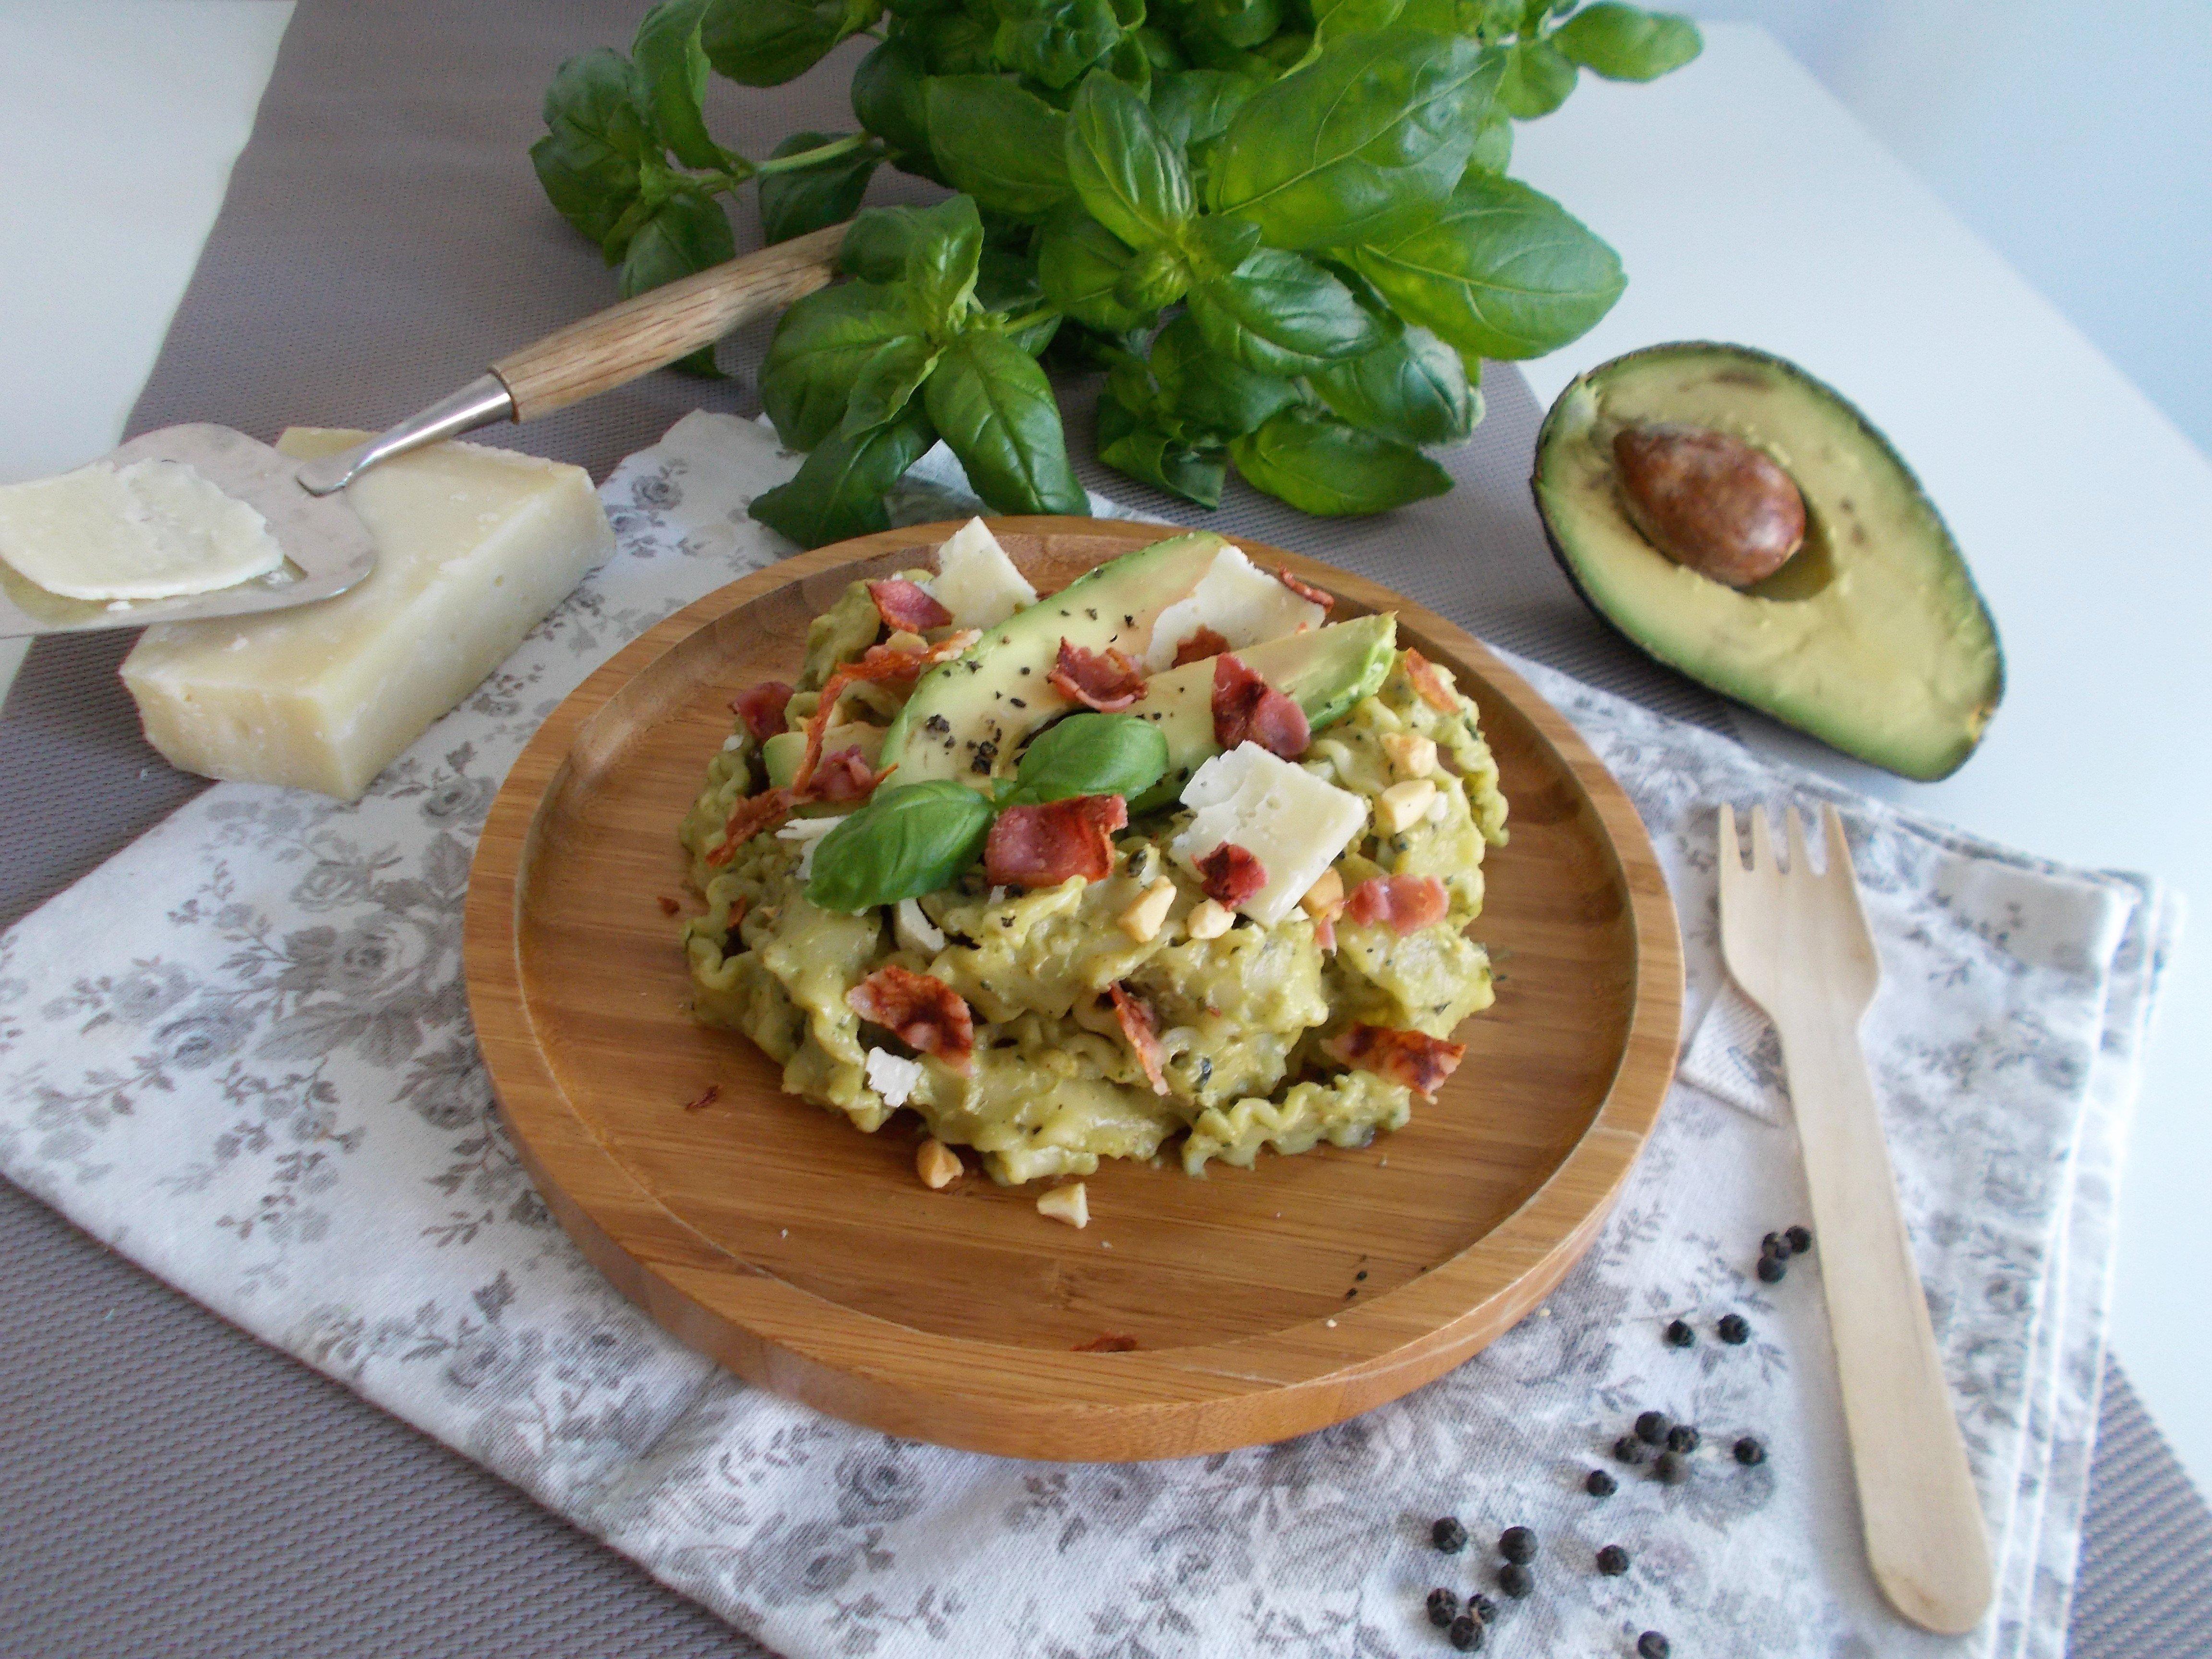 Pâtes au pesto d'avocat (creamy avocado pasta)